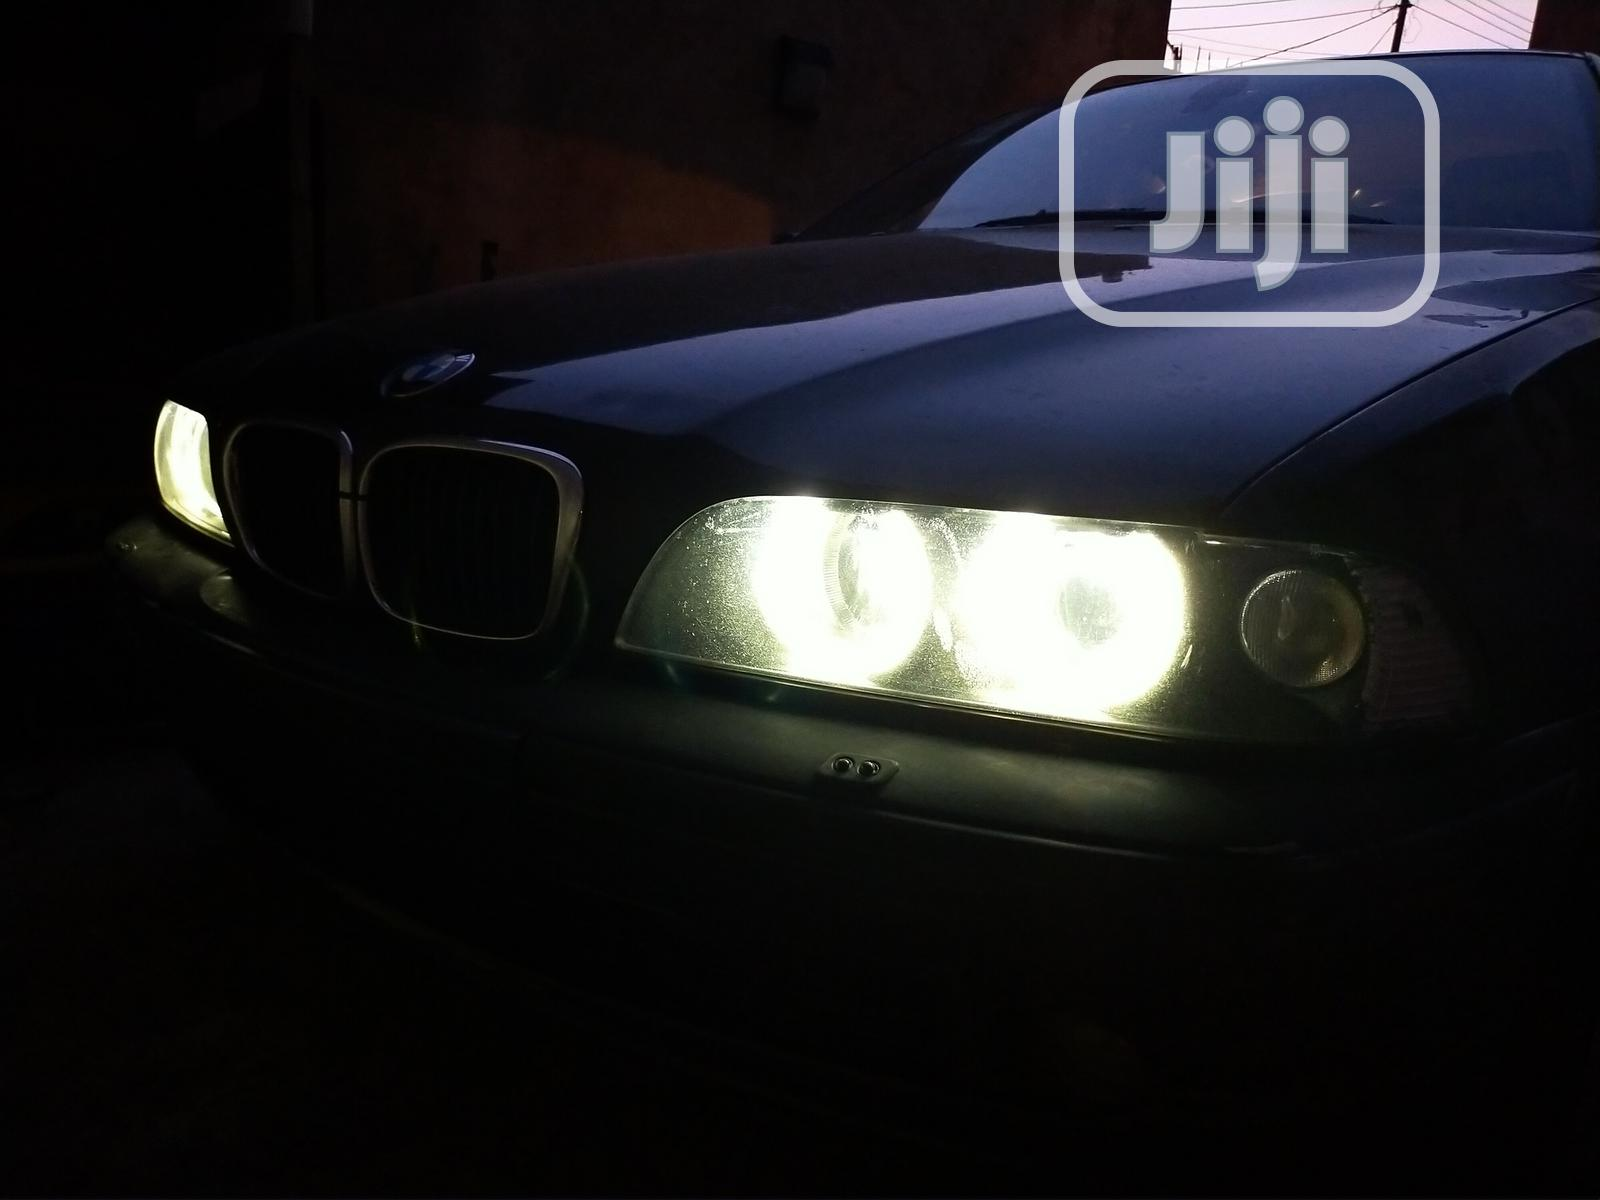 Archive: BMW 530i 2001 Black